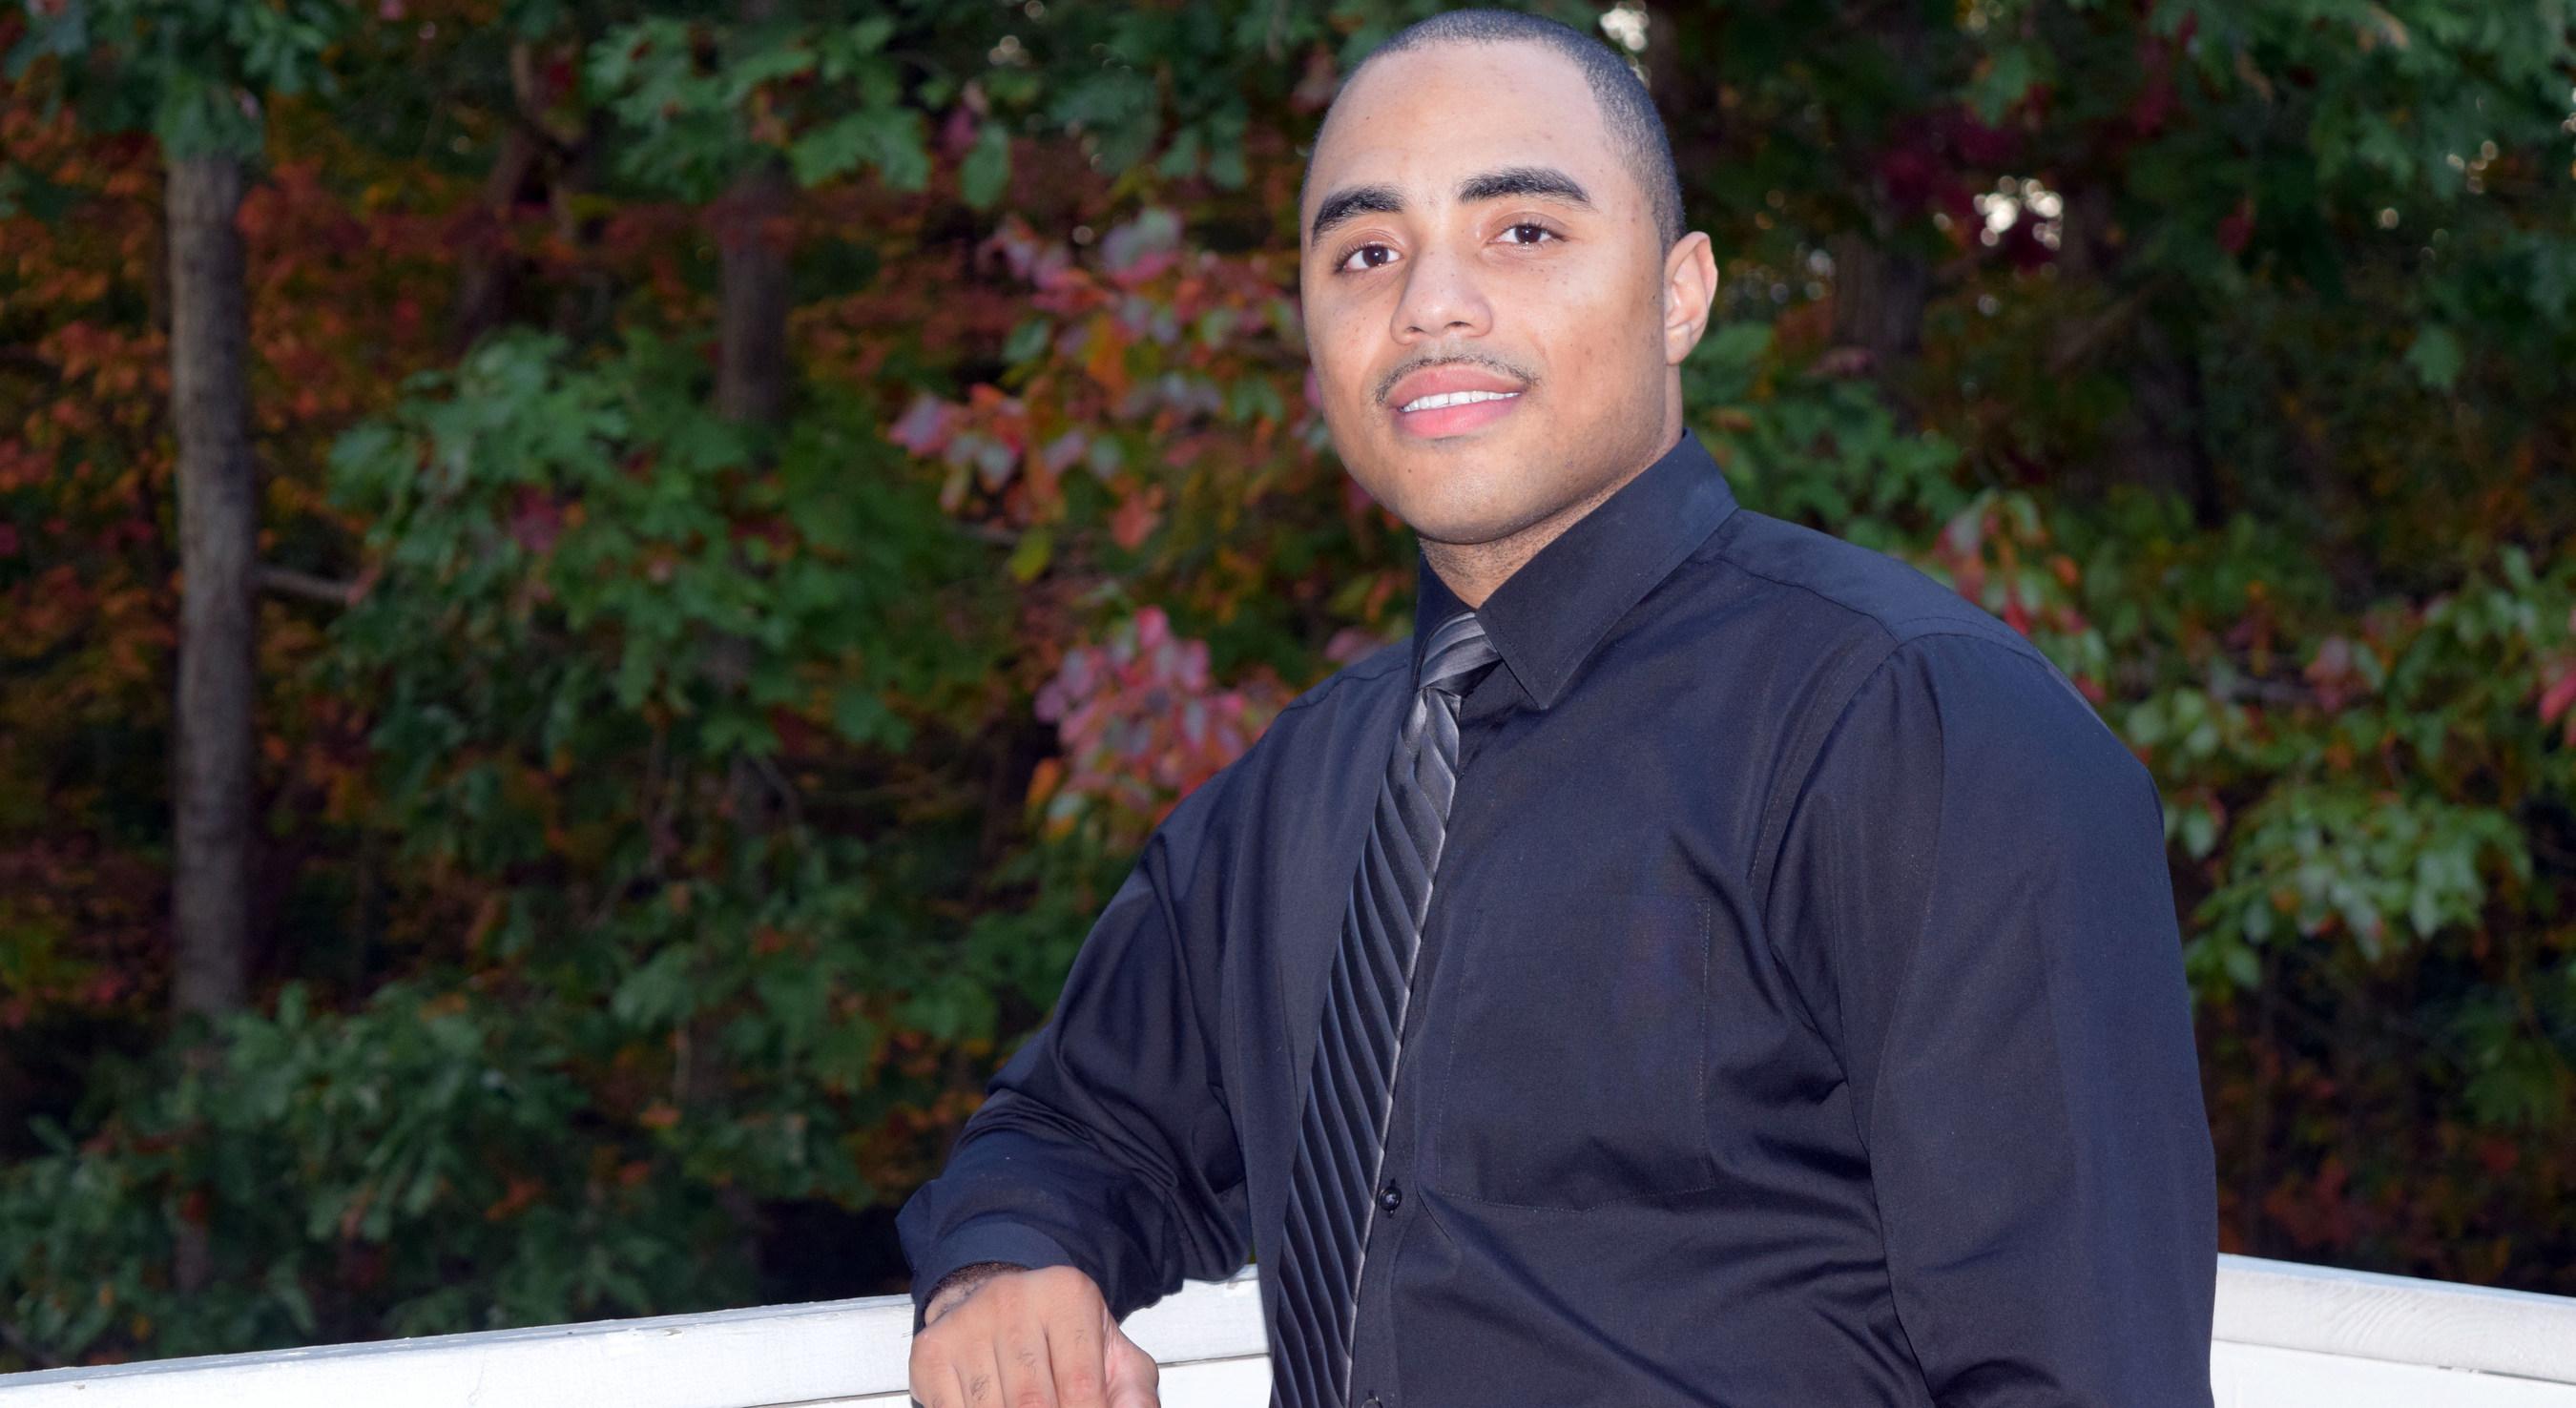 Black Entrepreneur Creates Trafek.com - an Online Marketplace Designed to Recirculate $1 Trillion Dollars Back in to Black Communities